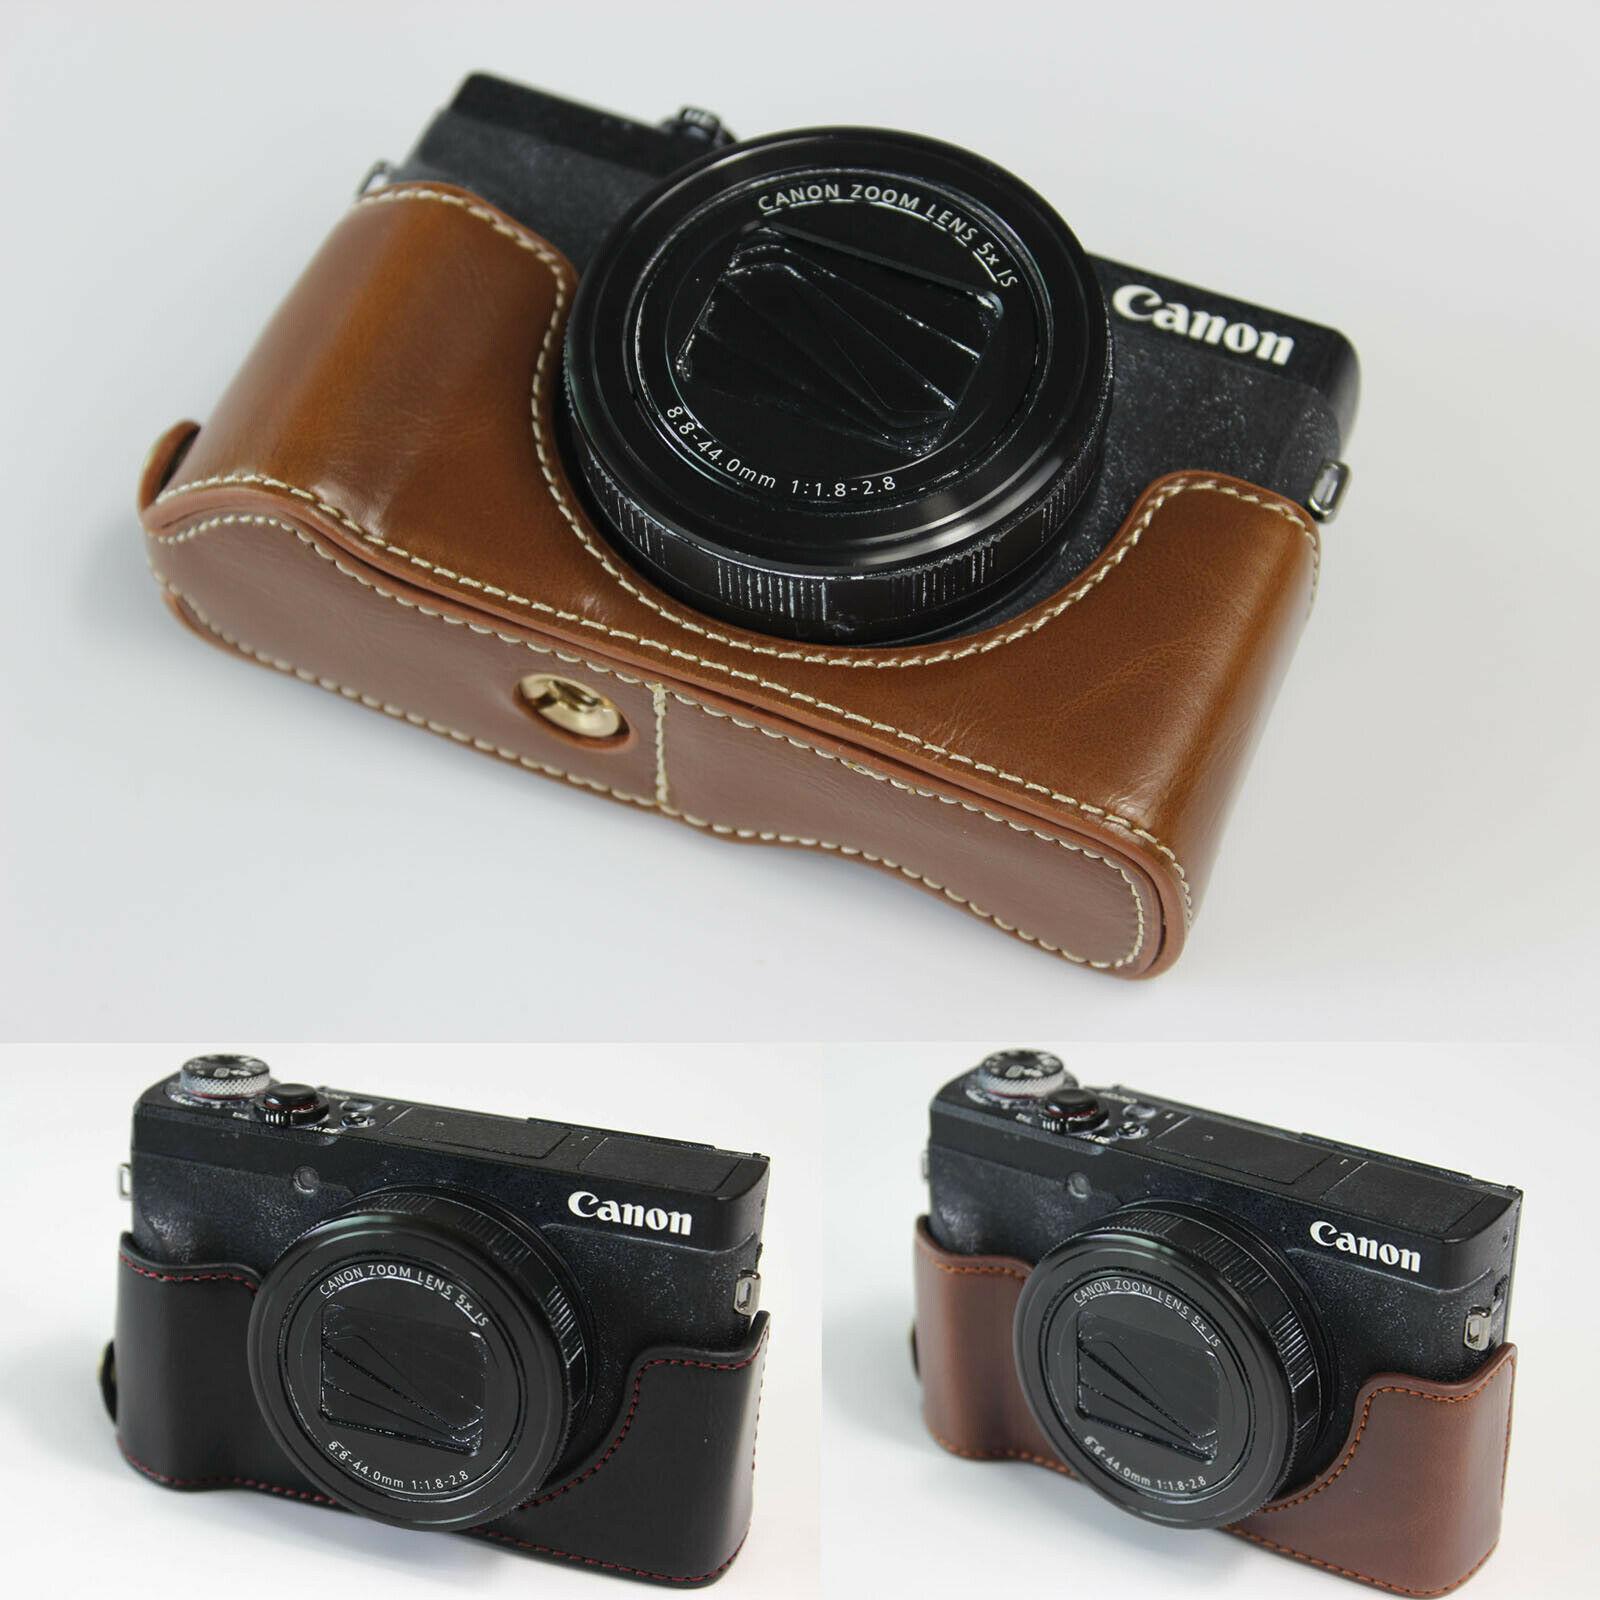 Gadget Place Black Light Weight Leather Wrist Strap for Canon PowerShot G9 X Mark II G7 X Mark II G5 X G3 X G1 X